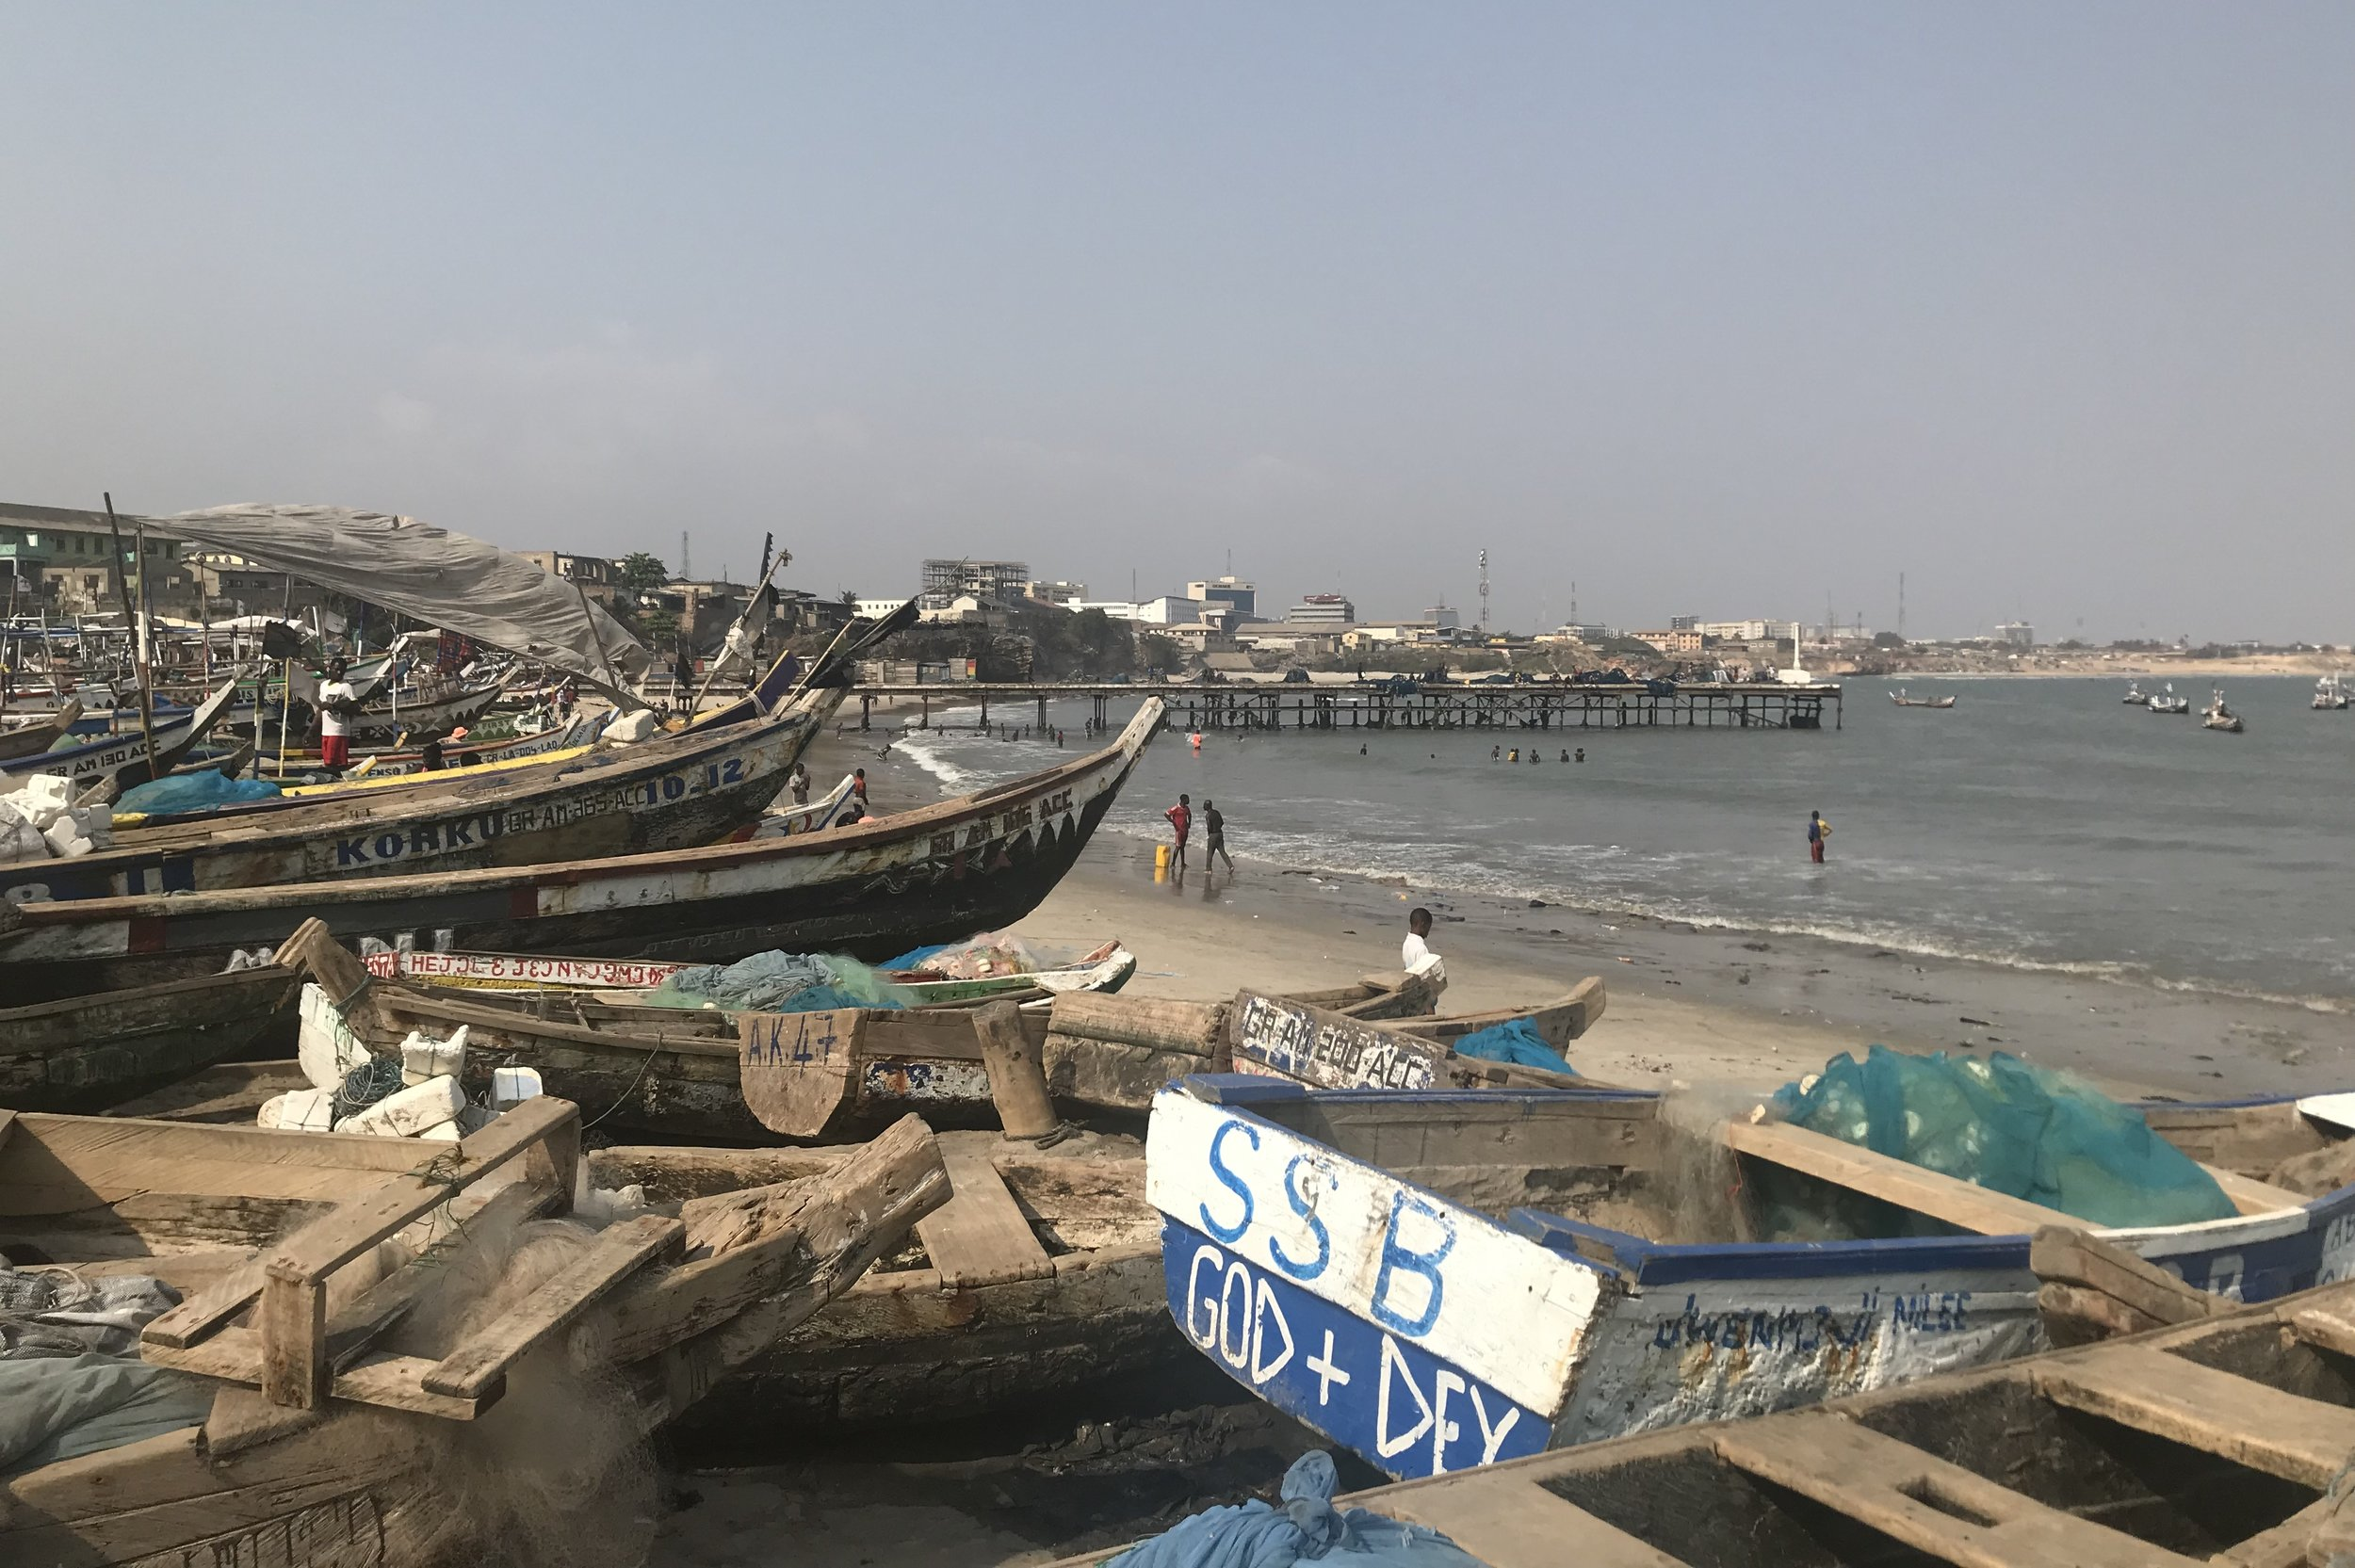 Jamestown fishing harbour – Boats